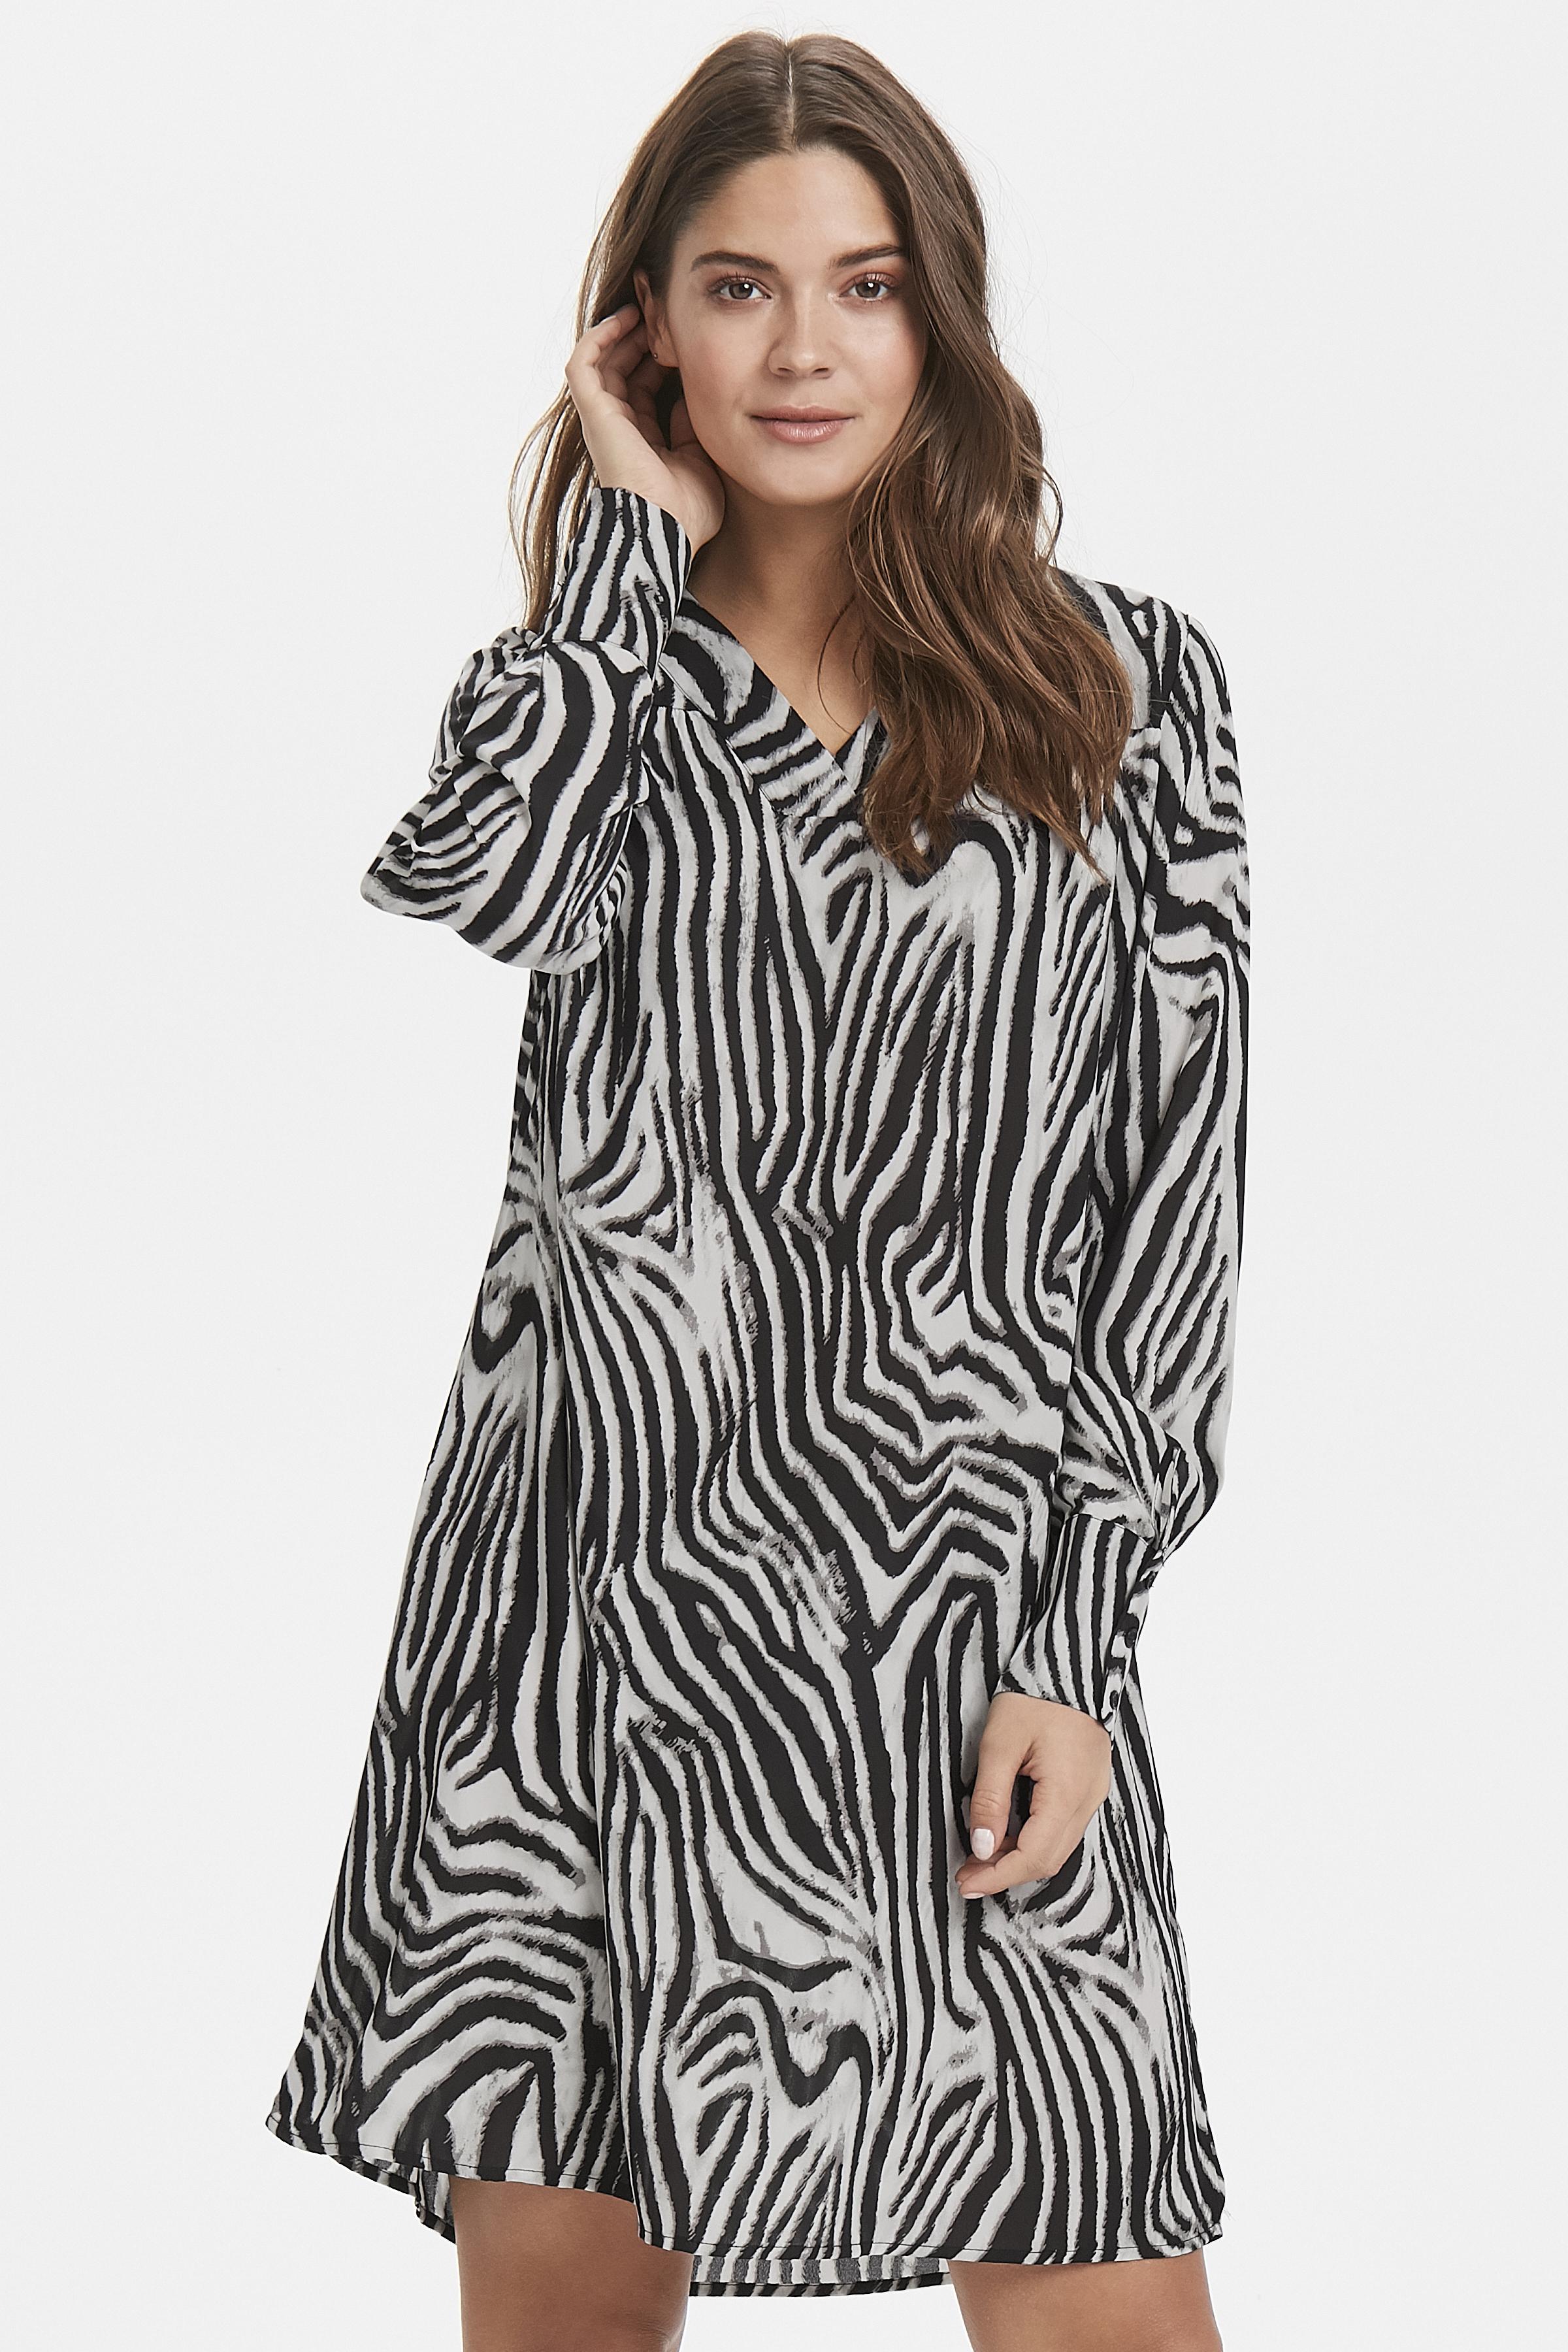 Zebra combi 1 Klänning från b.young – Köp Zebra combi 1 Klänning från storlek 34-42 här